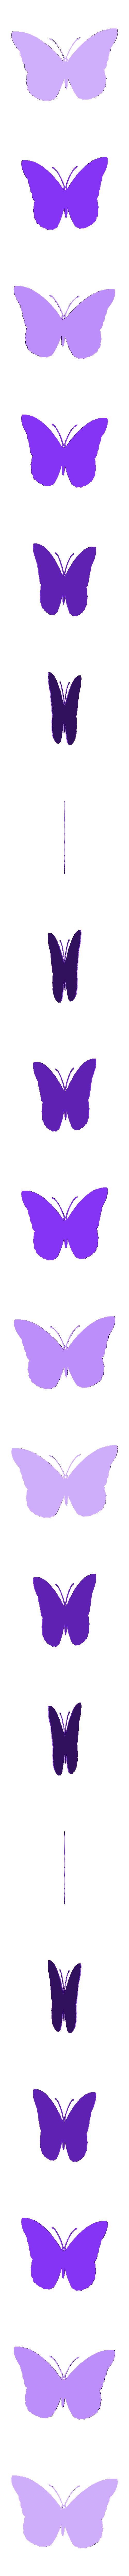 Fond.stl Download free STL file Monarch Butterfly • 3D print design, oasisk